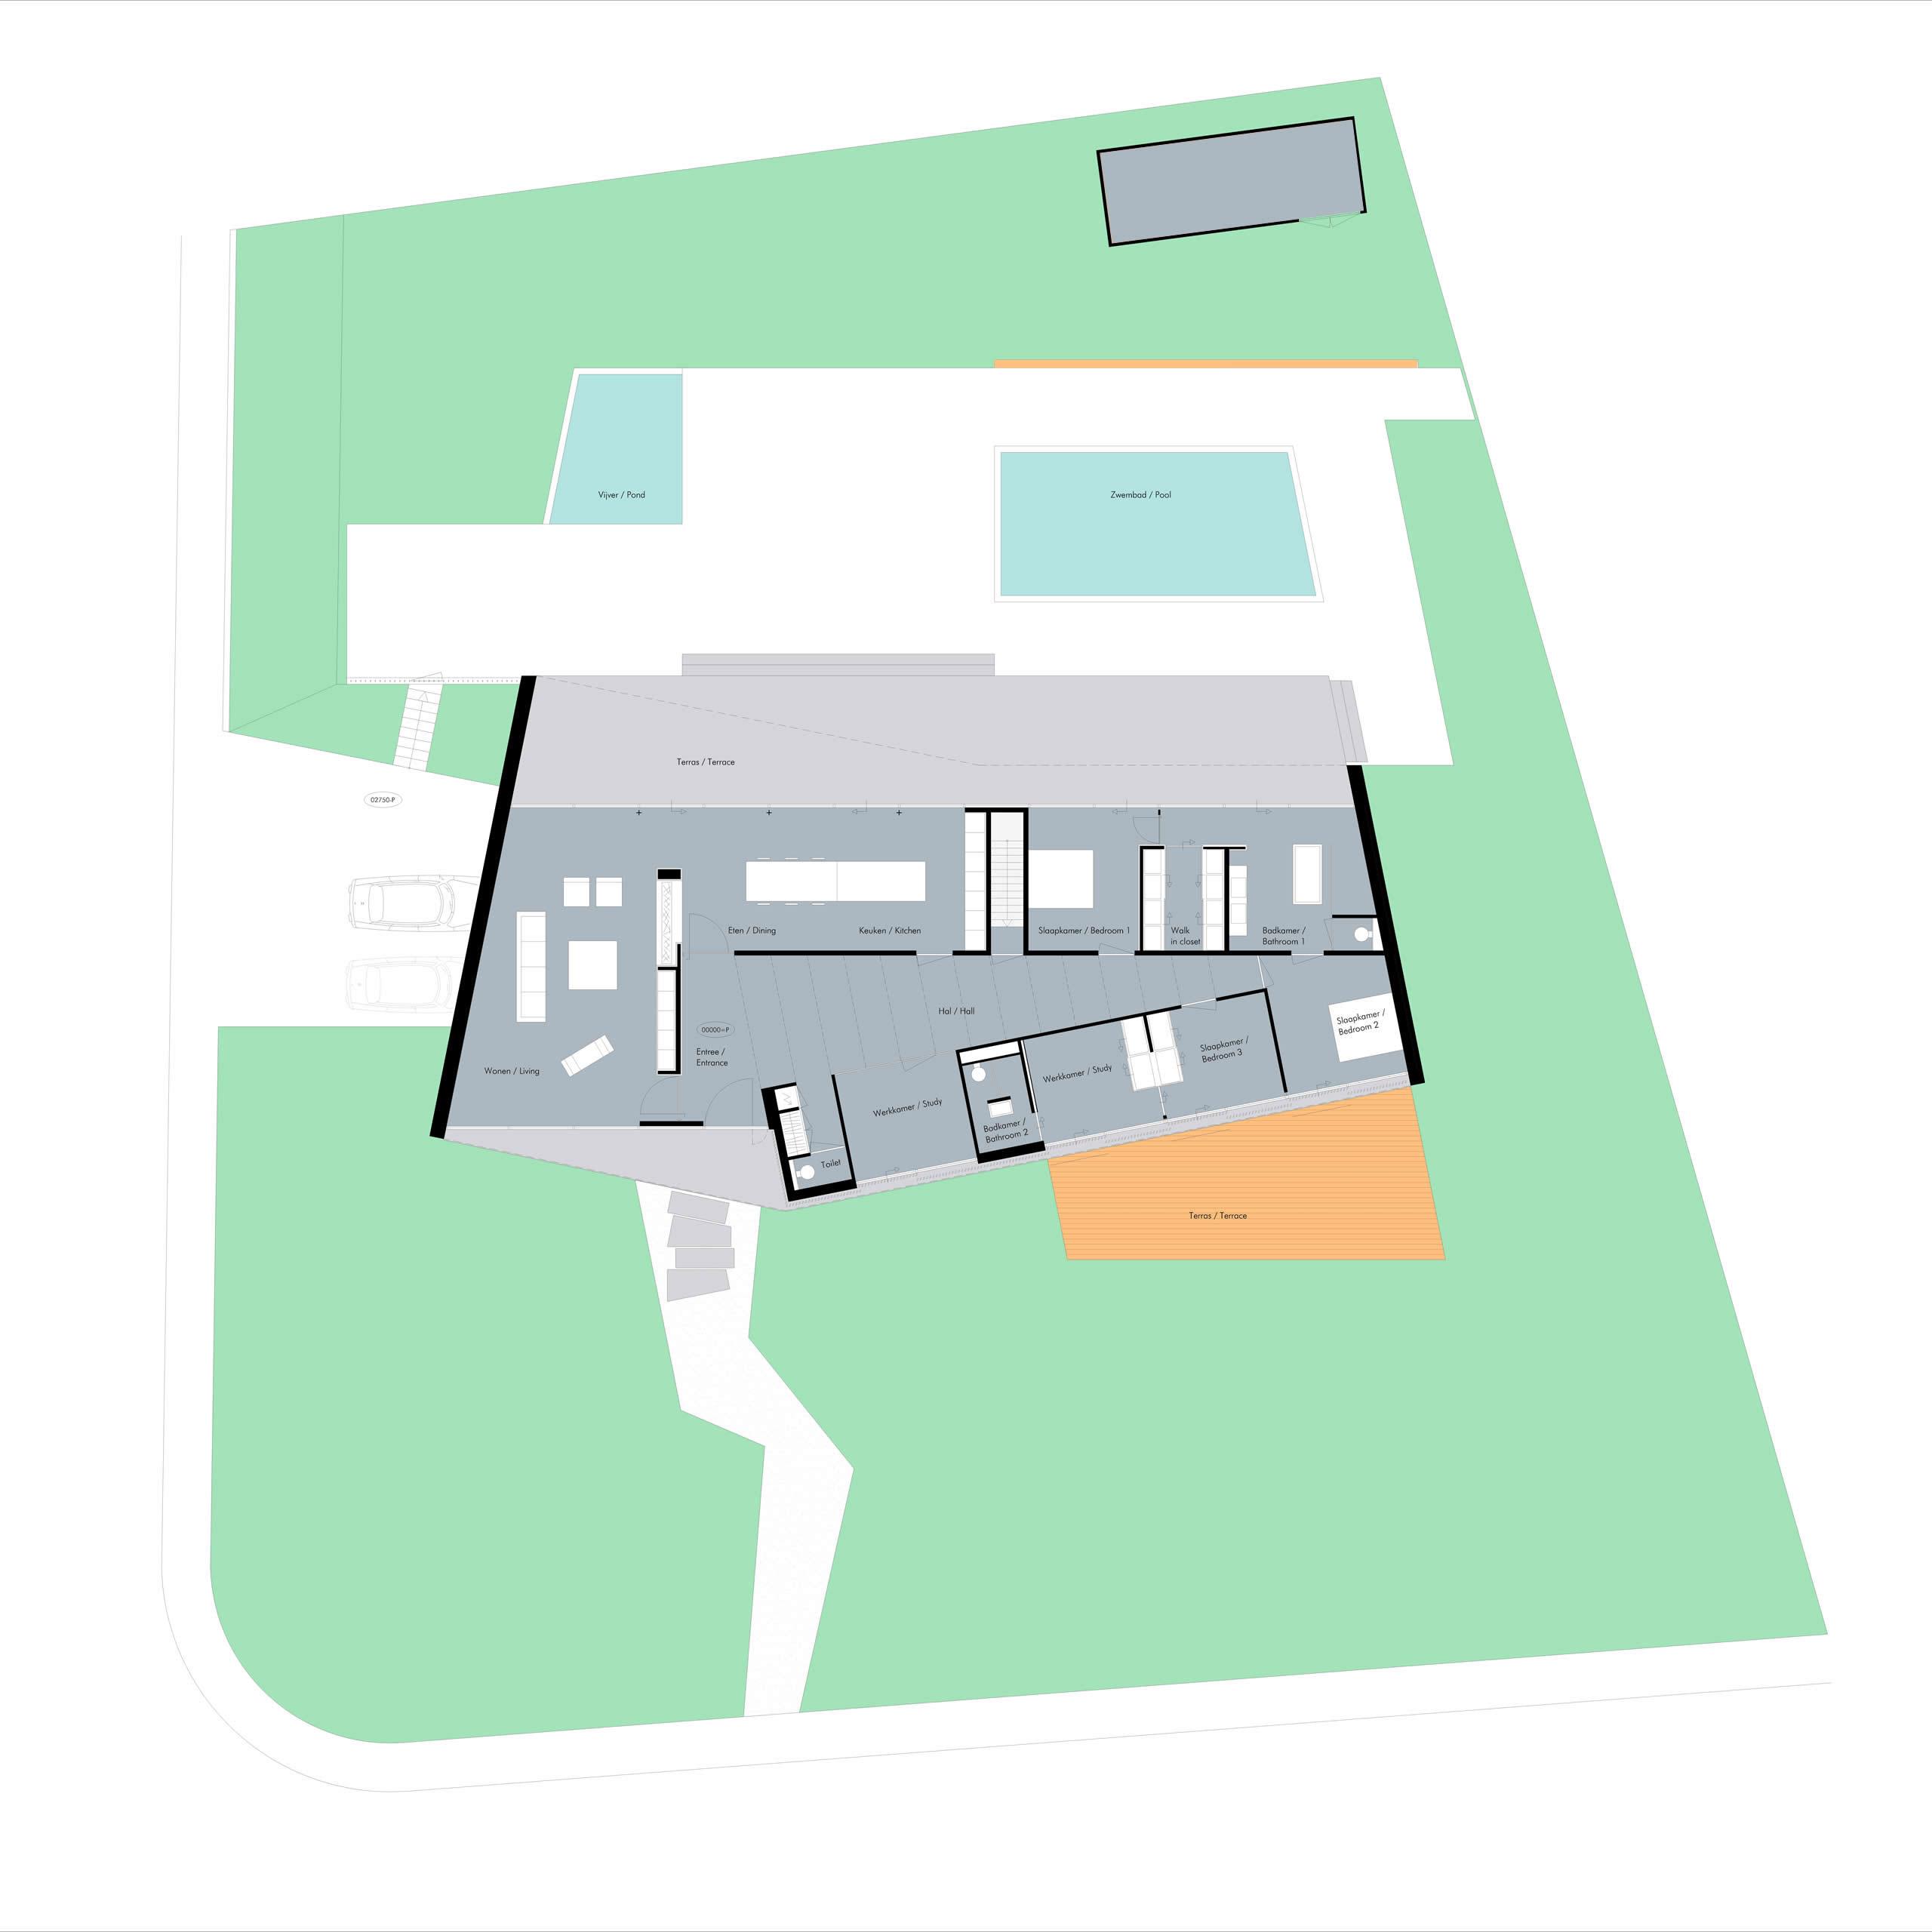 Boxed Villa Spee Haelen with Panoramic Windows by Lab32 architecten-32